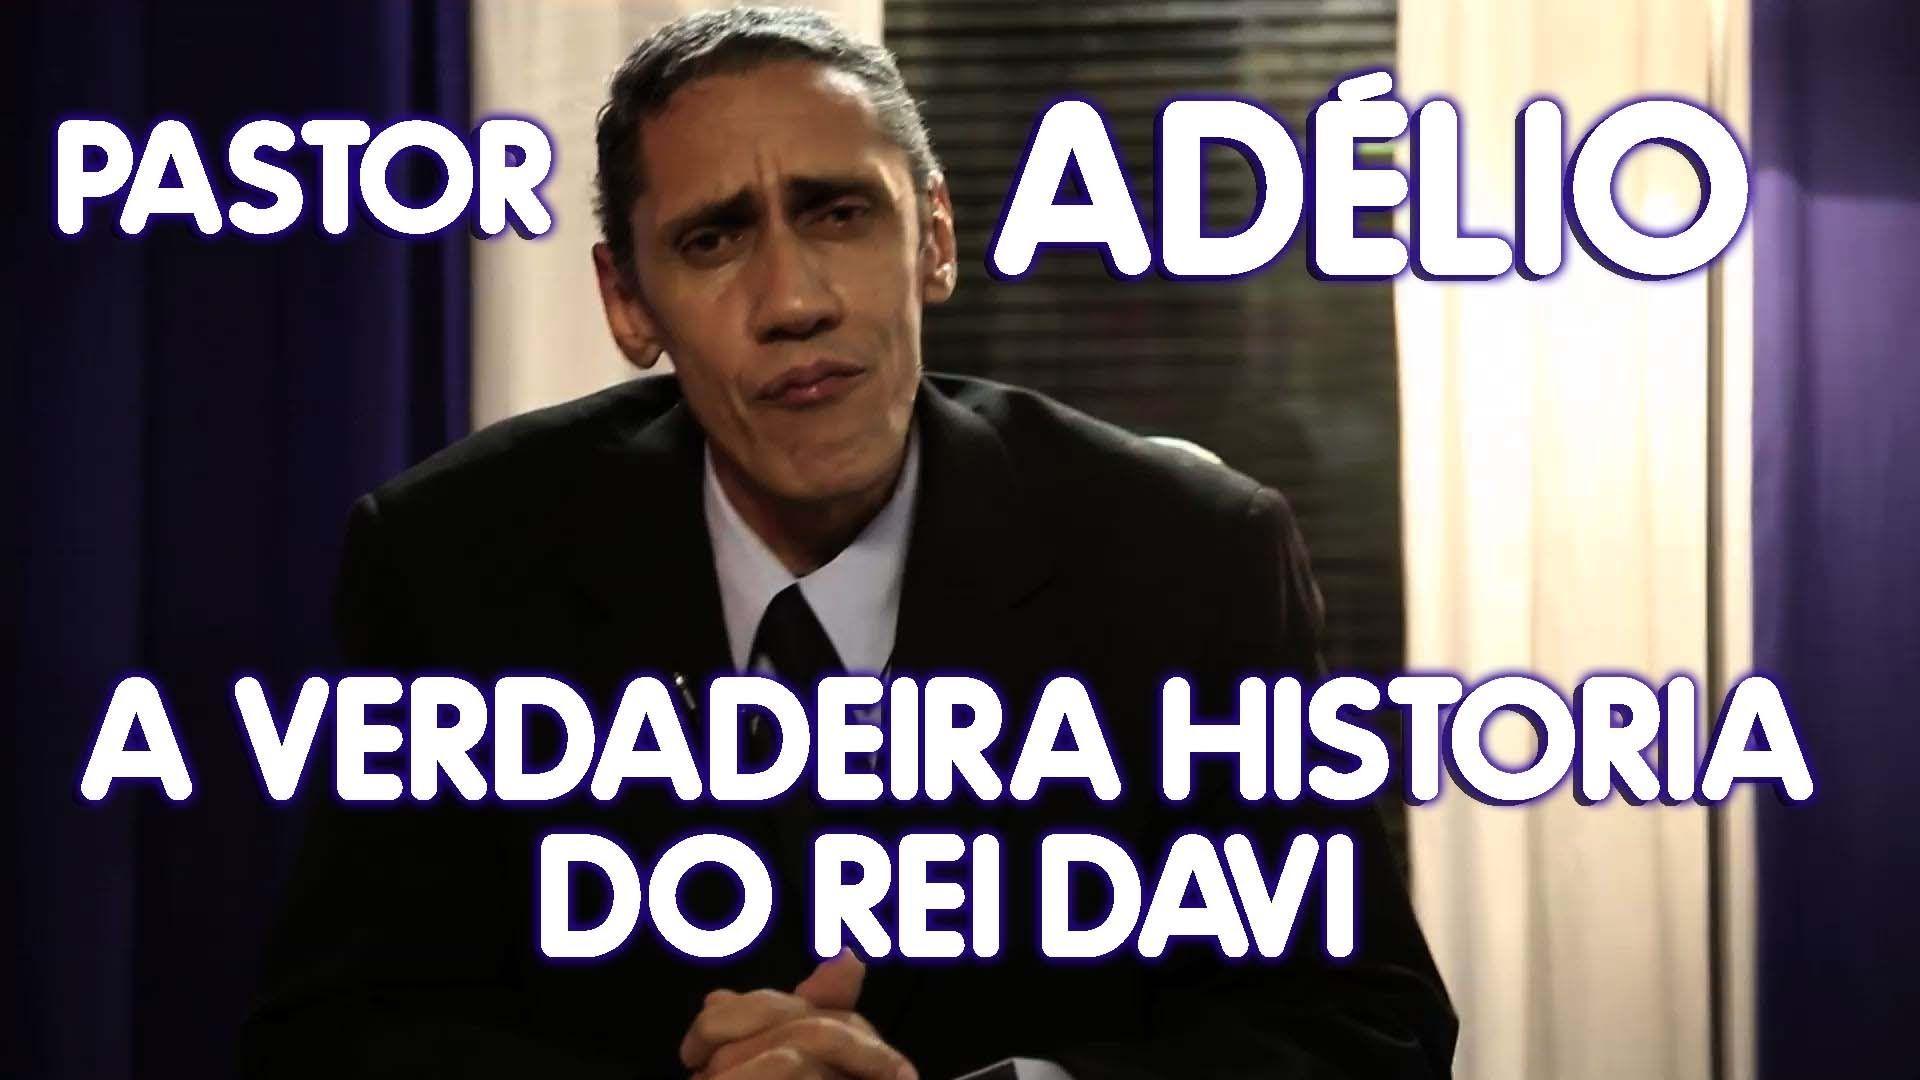 Pastor Adelio - Adulterio de Davi - (Minister Adelio Talks about King Da...